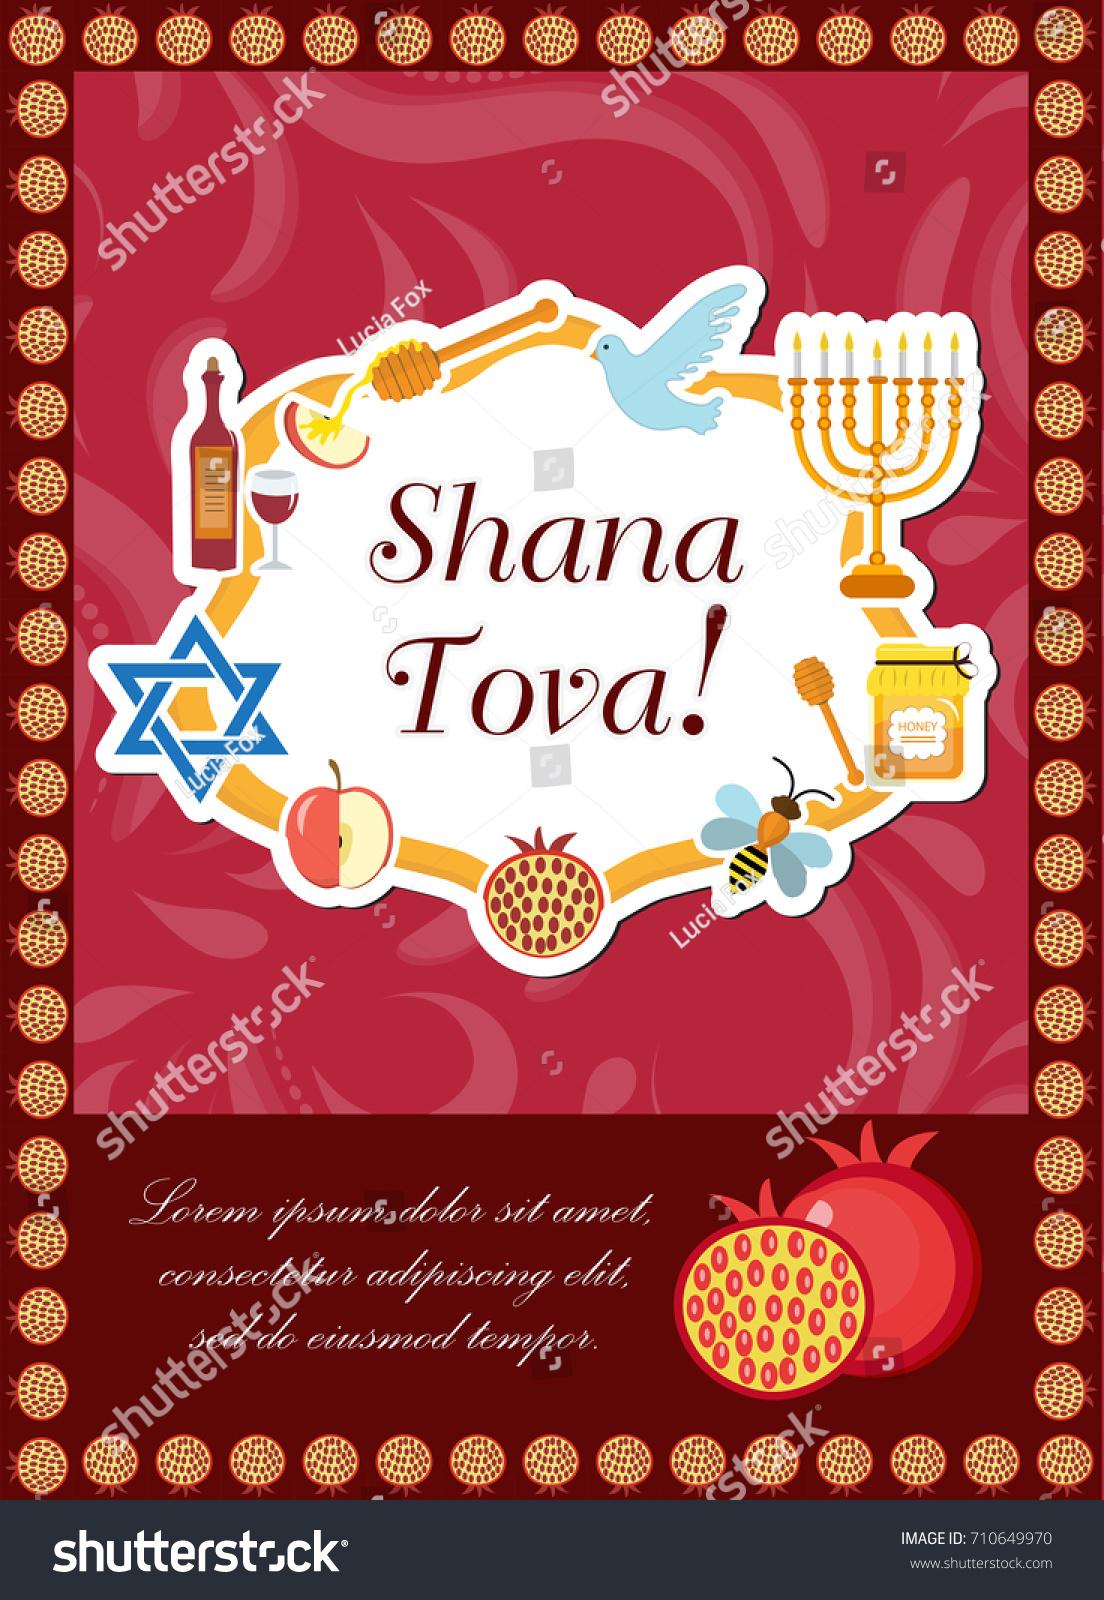 Rosh hashanah poster flyer invitation greeting stock vector rosh hashanah poster flyer invitation greeting card shana tova is a template kristyandbryce Images